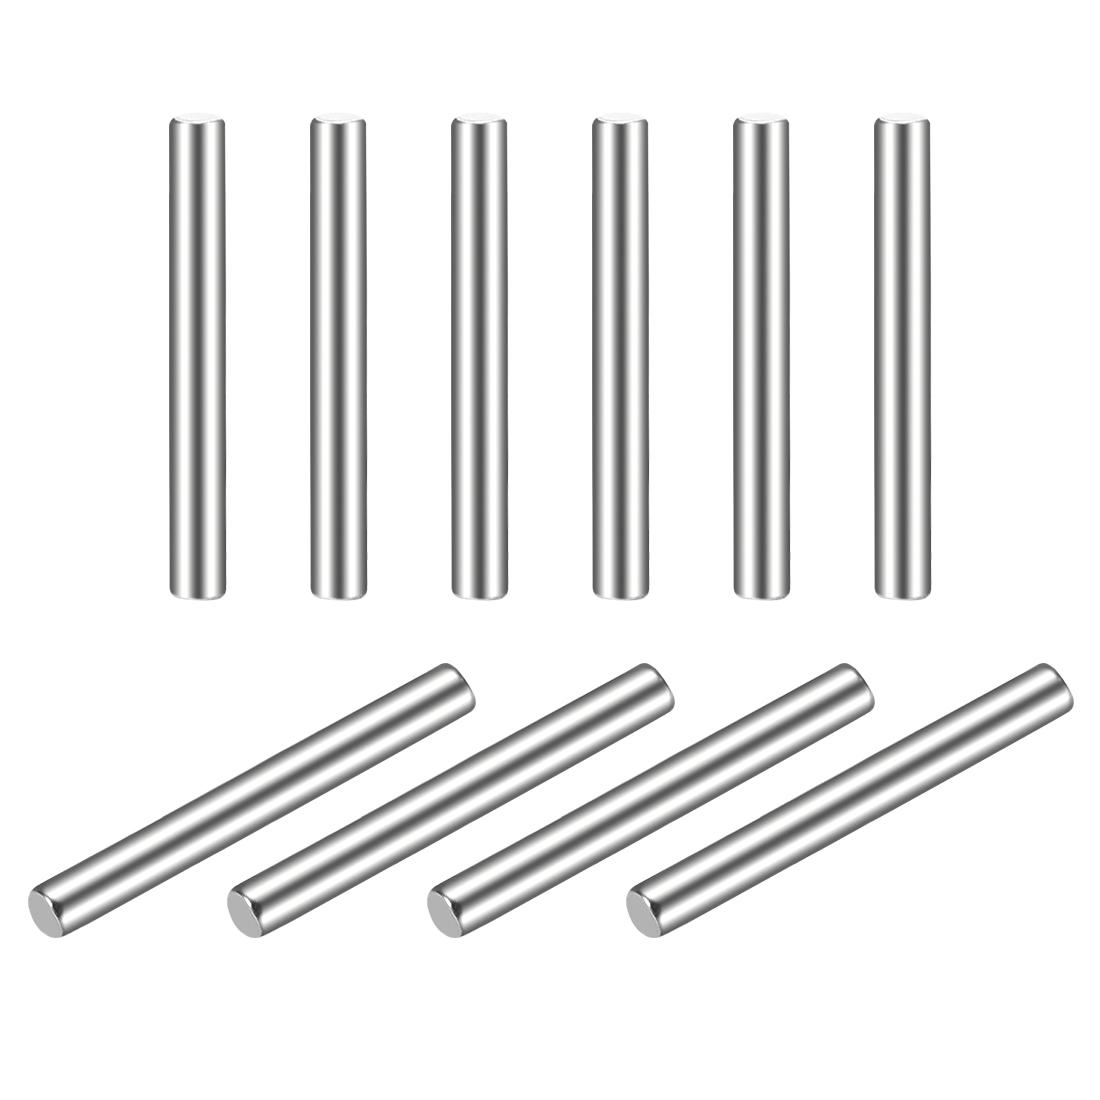 10Pcs 2mm x 18mm Dowel Pin 304 Stainless Steel Shelf Support Pin Fasten